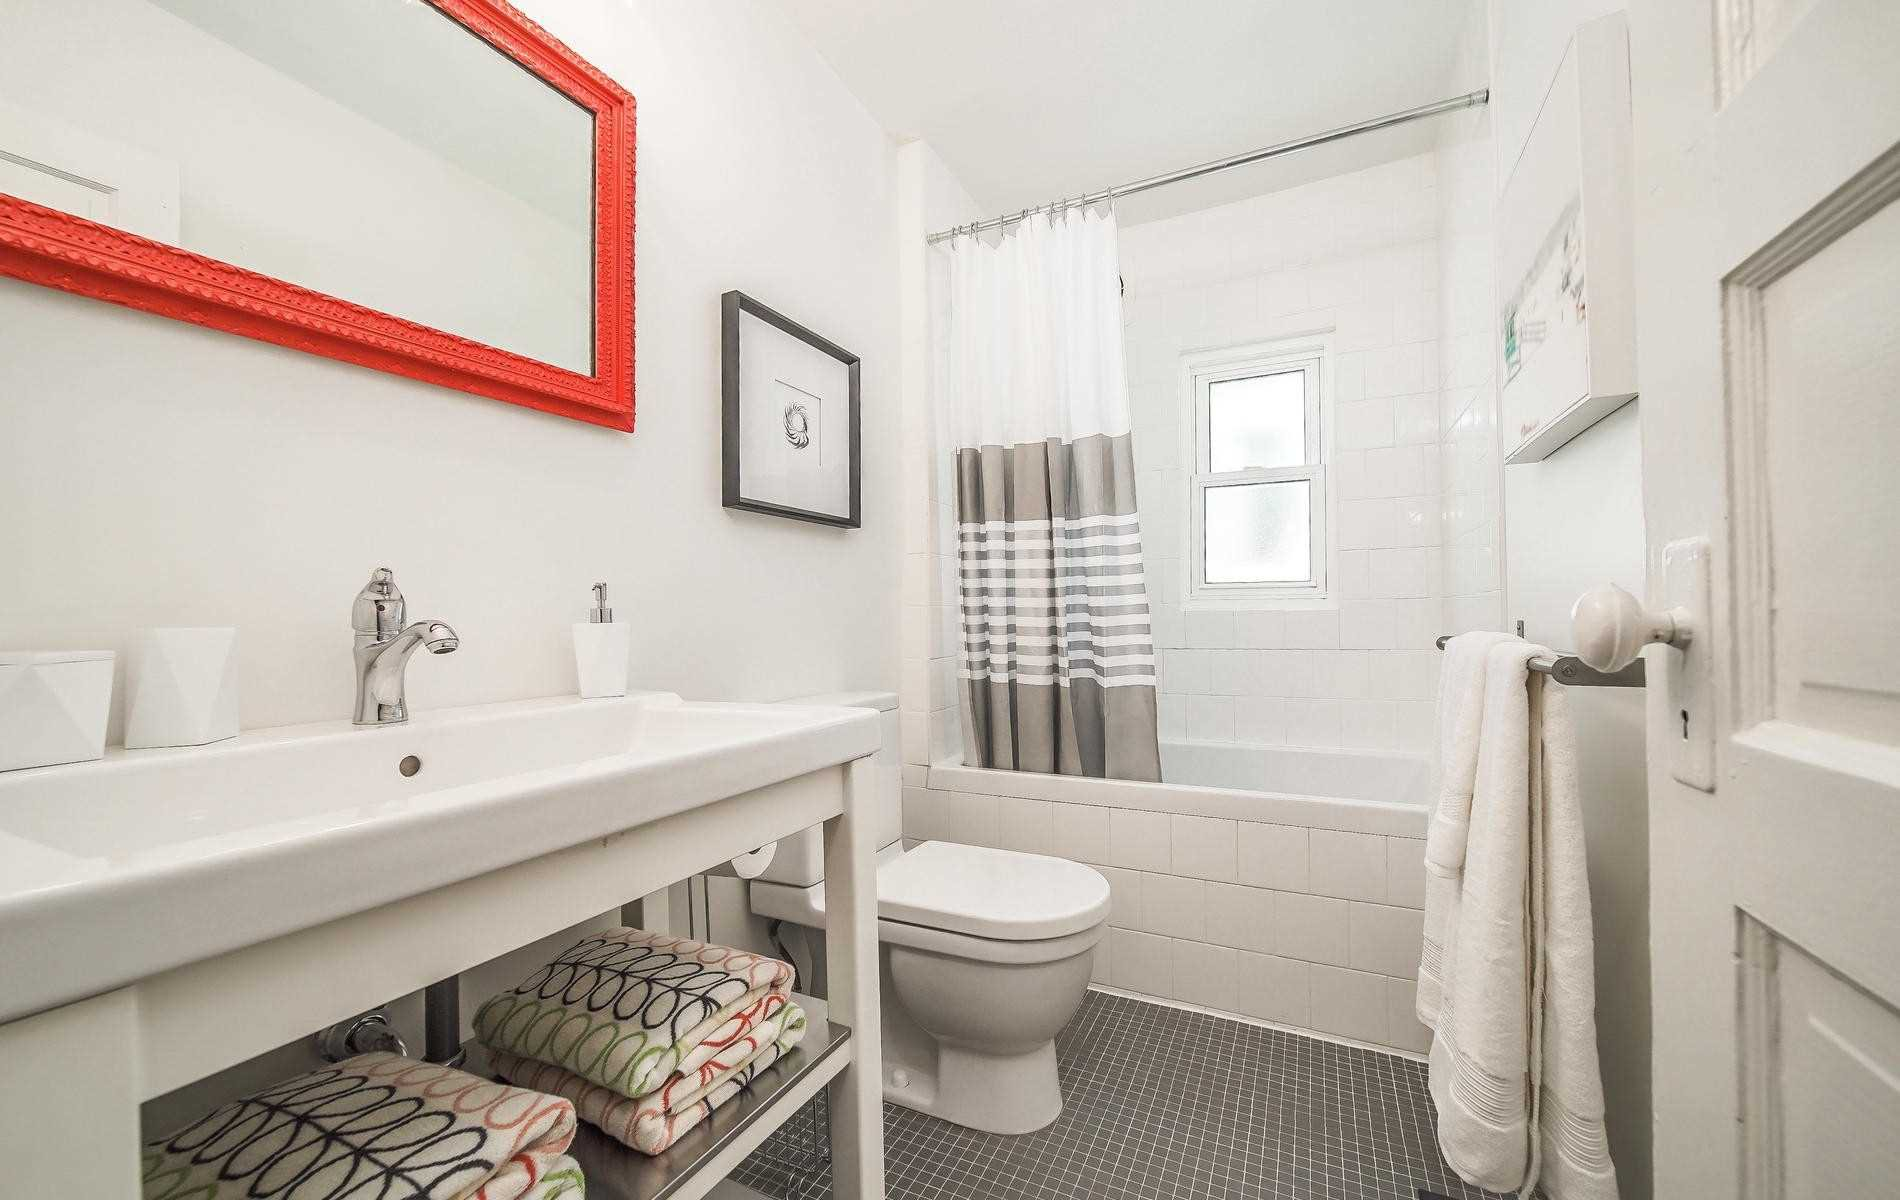 Photo 13: Photos: 64 Larchmount Avenue in Toronto: South Riverdale House (2-Storey) for sale (Toronto E01)  : MLS®# E4489752